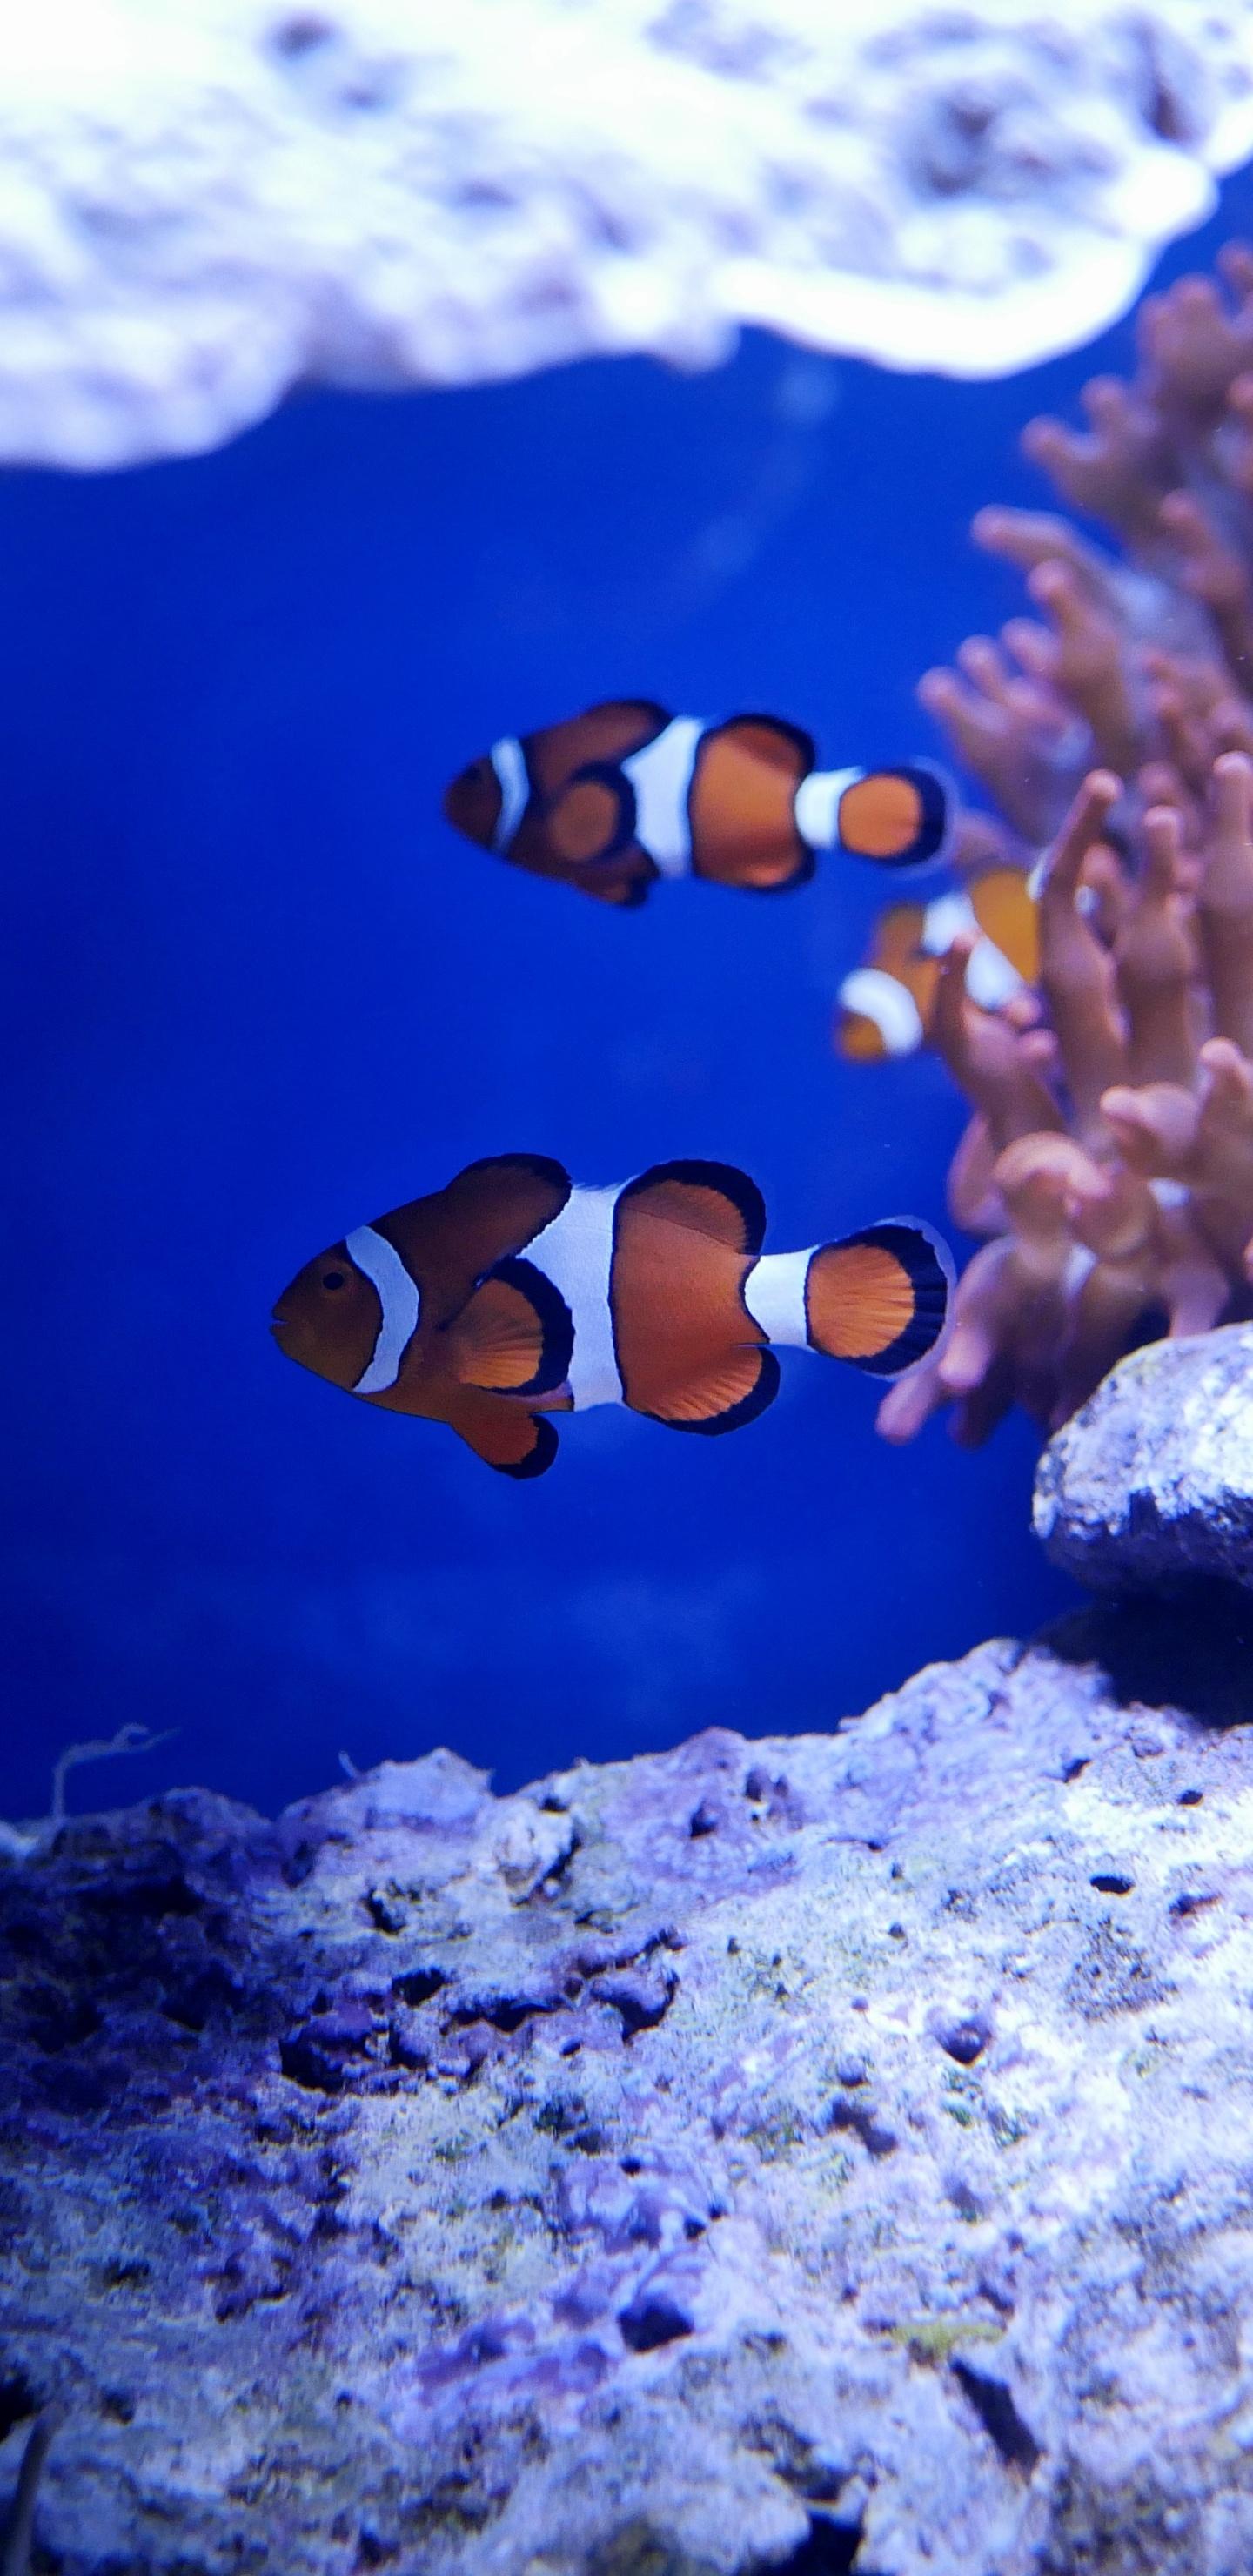 1440x2960 Nemo Fish In Real Underwater 5k Samsung Galaxy Note 9 8